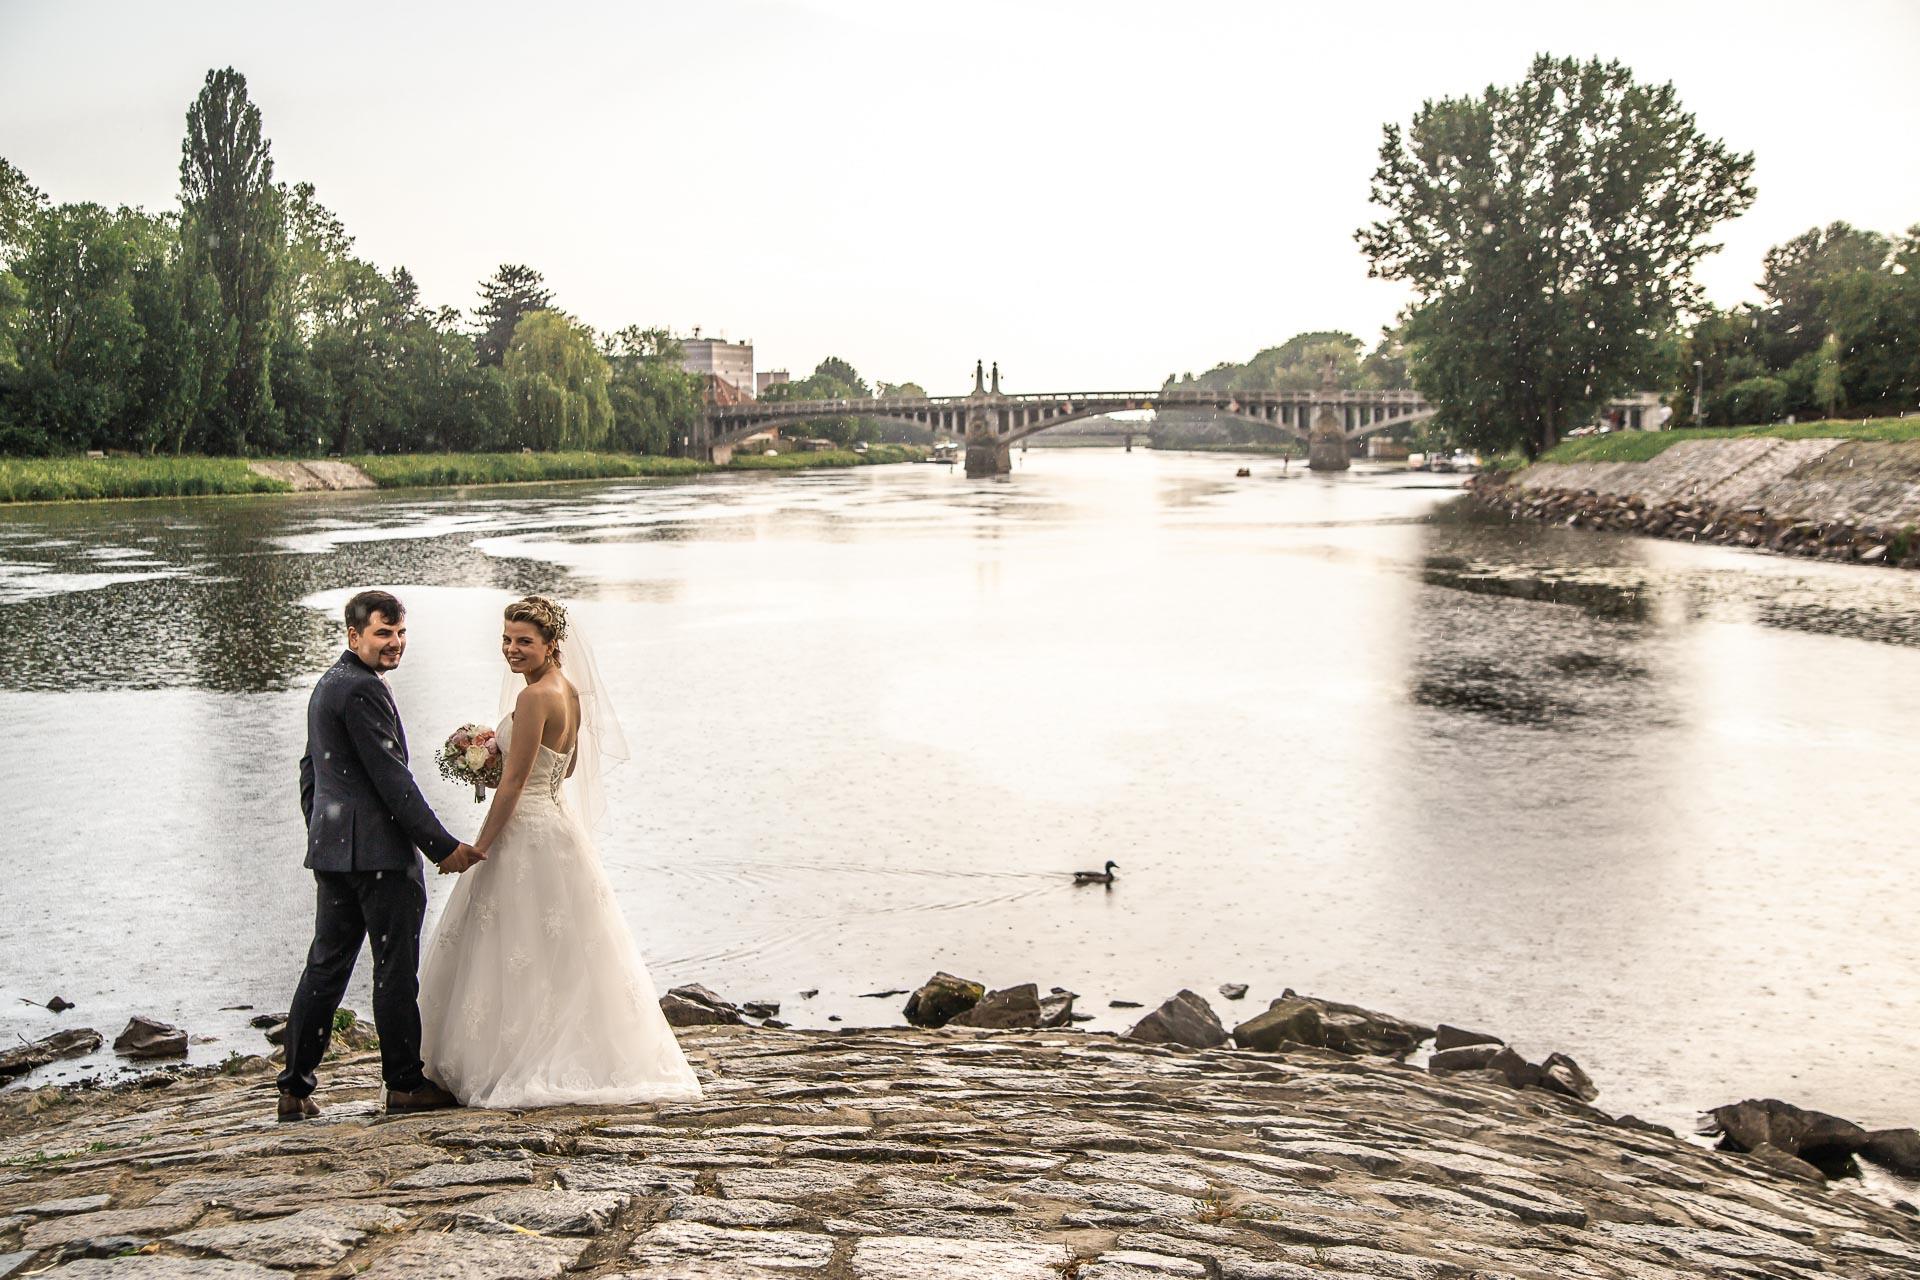 Svatební-fotograf-Nymburk-6227